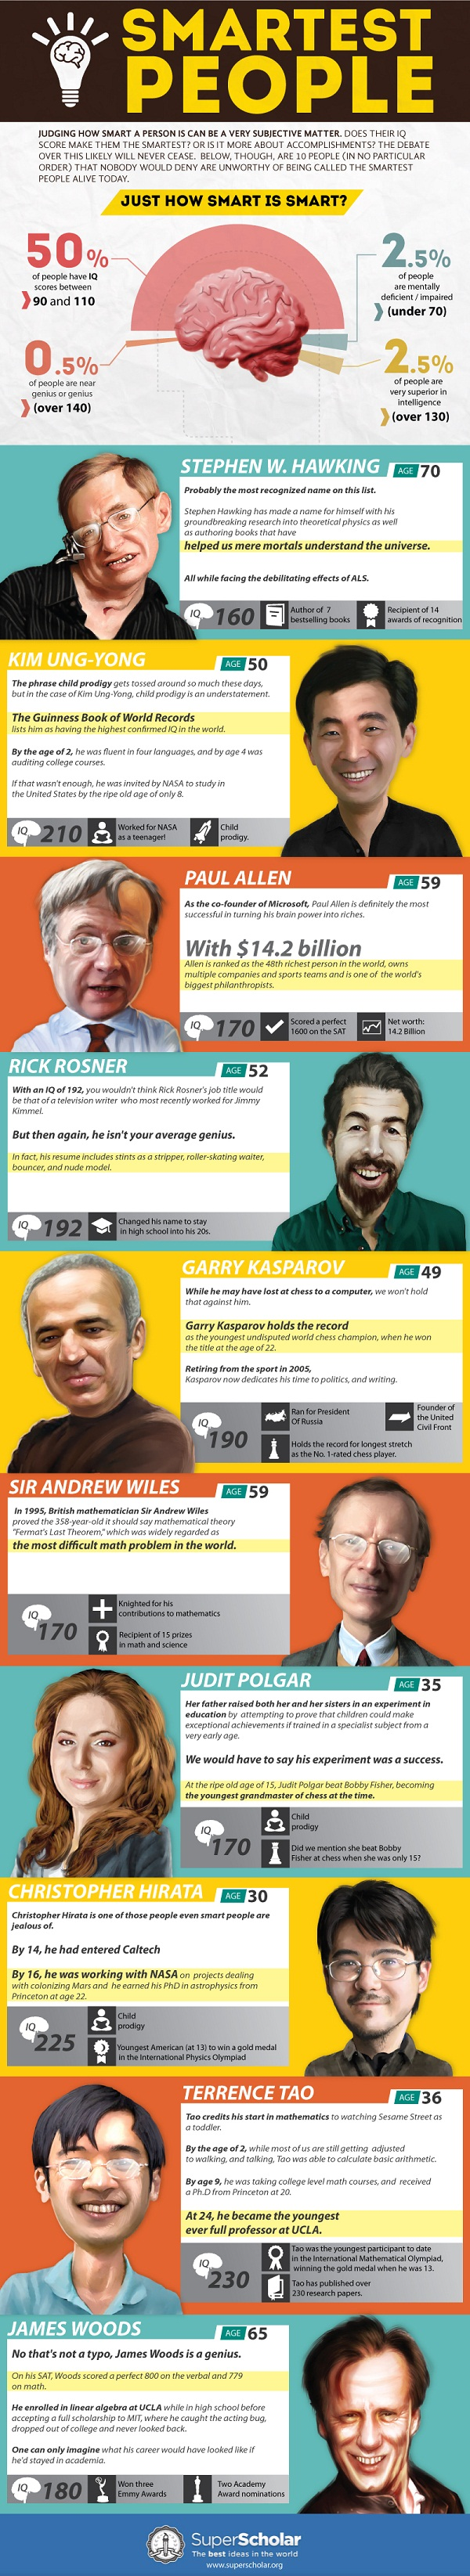 Smartest people. #infogrfia #infographic